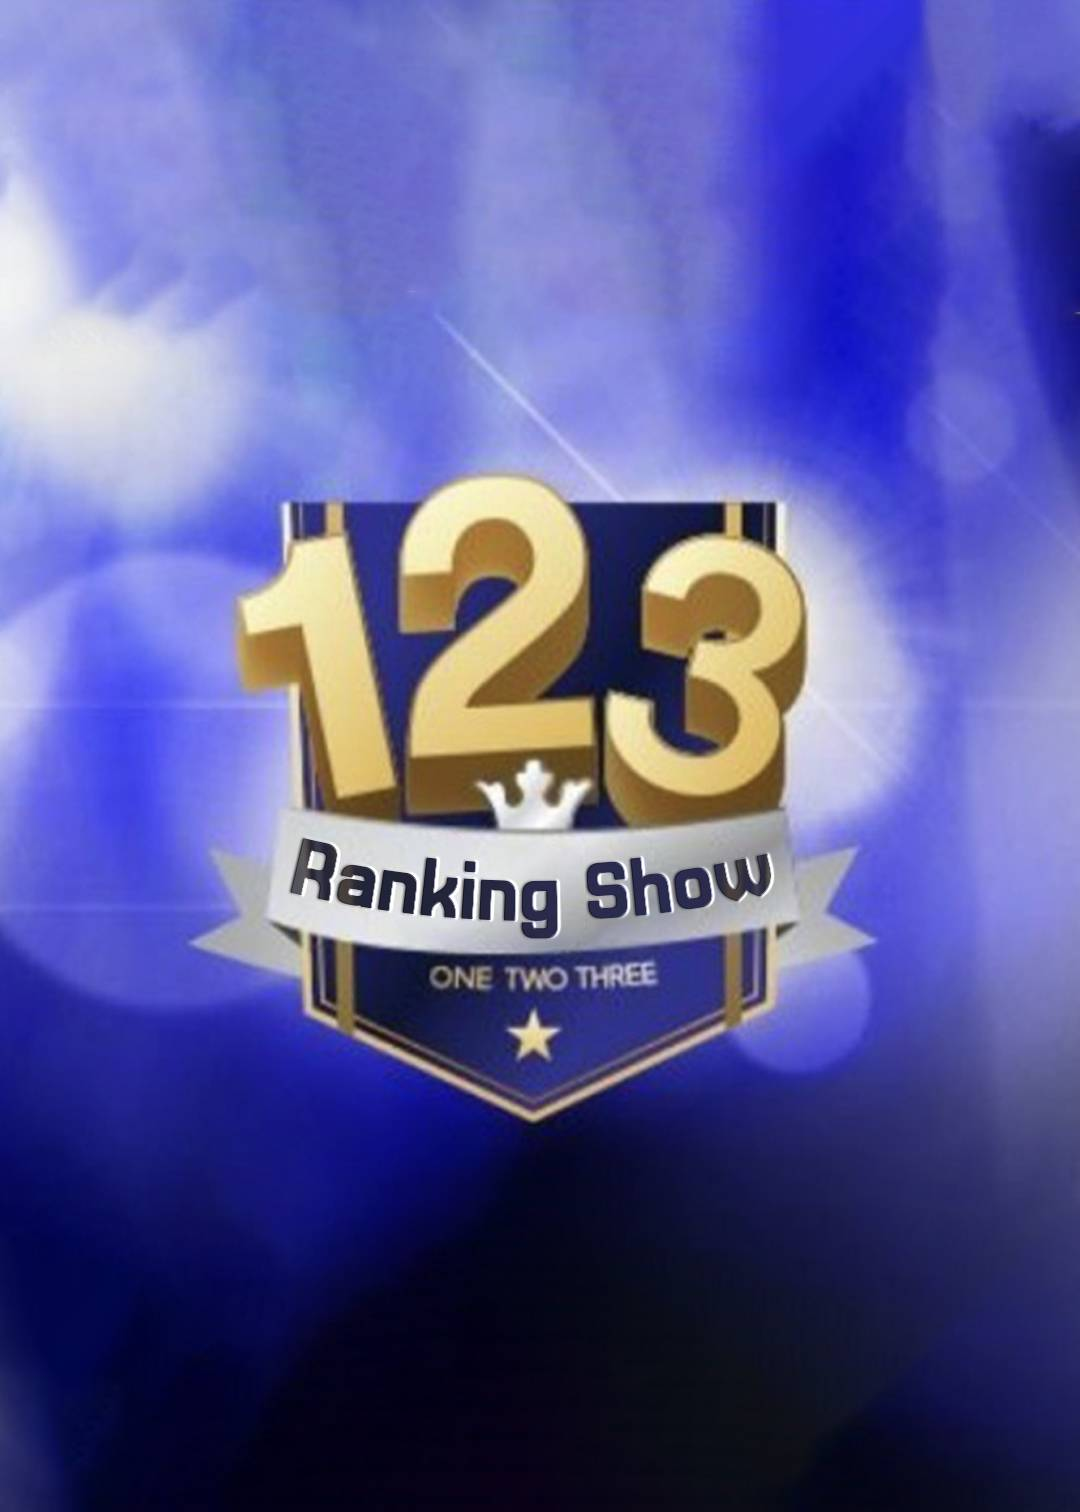 Ranking Show